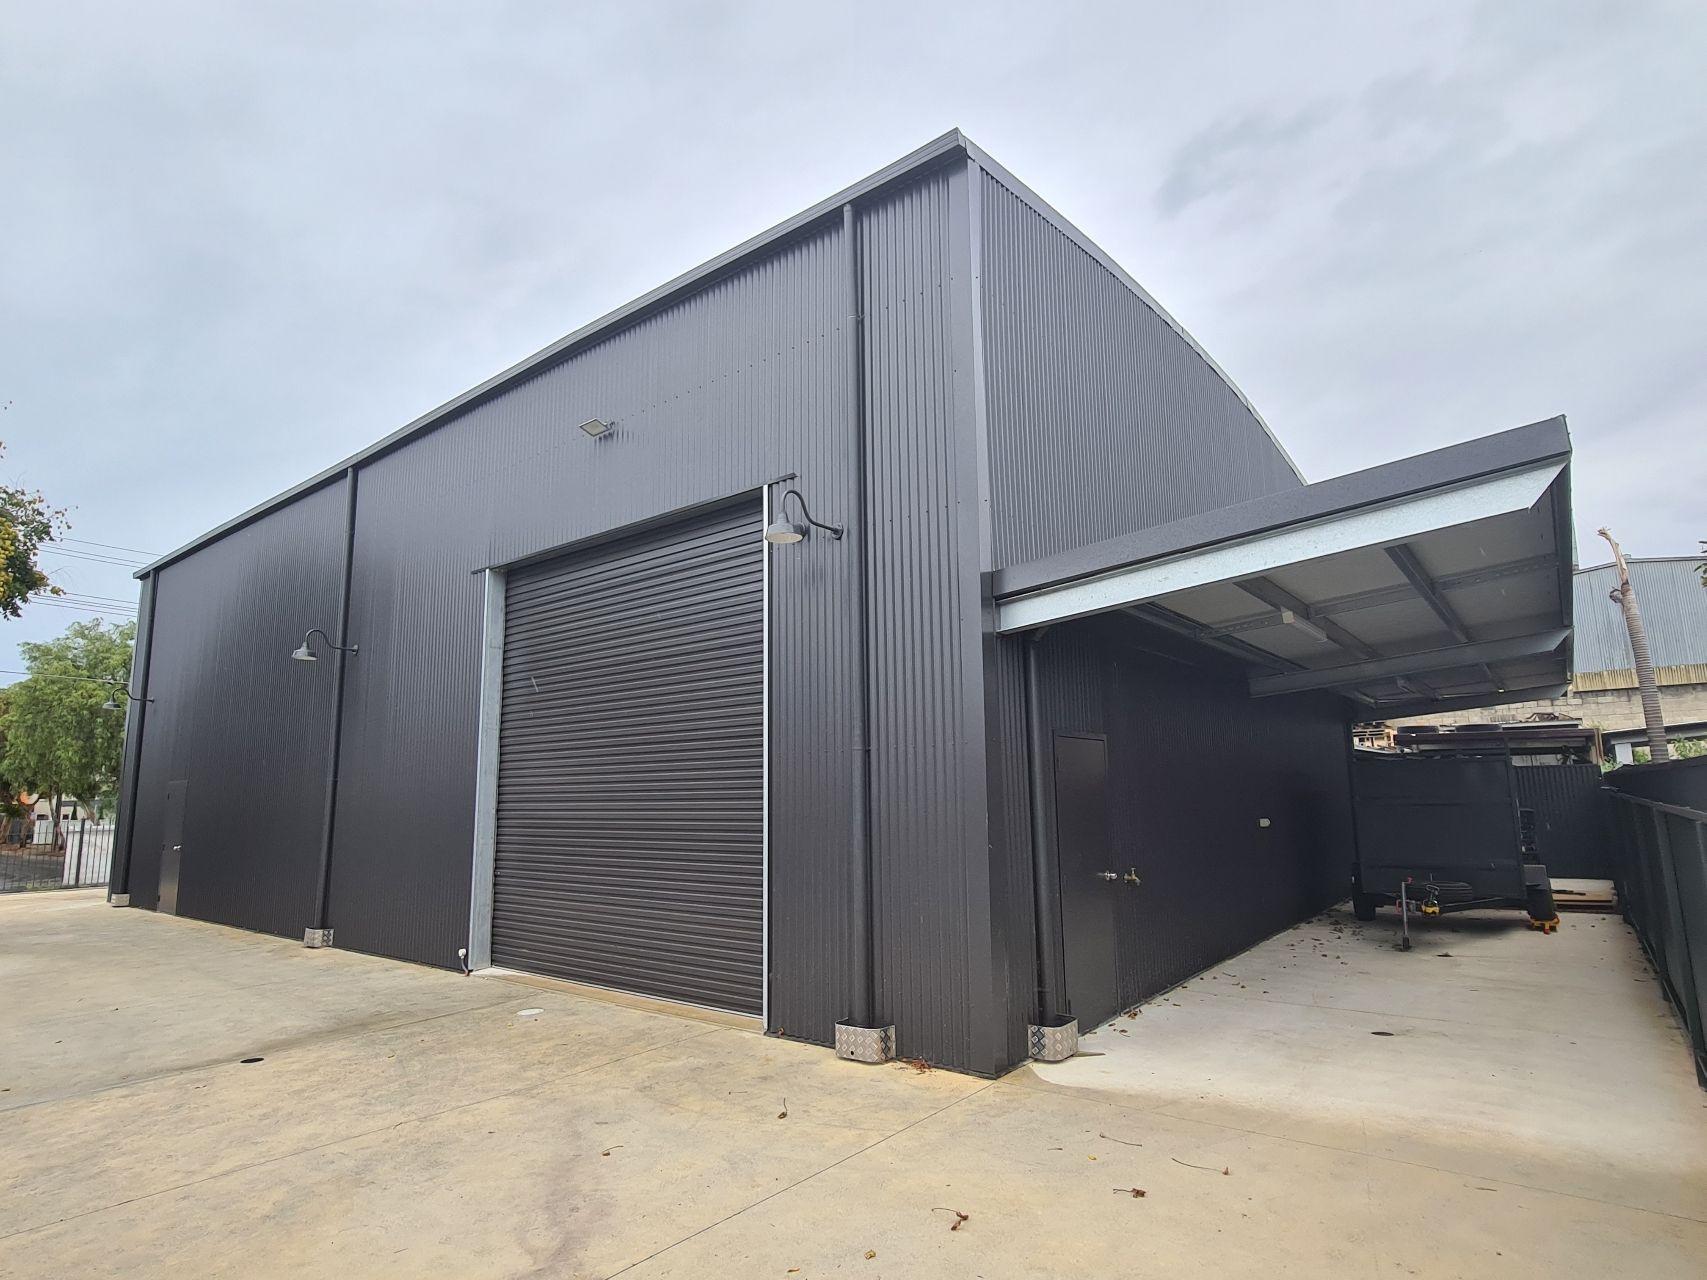 spanlift workshop office - Commercial Buildings